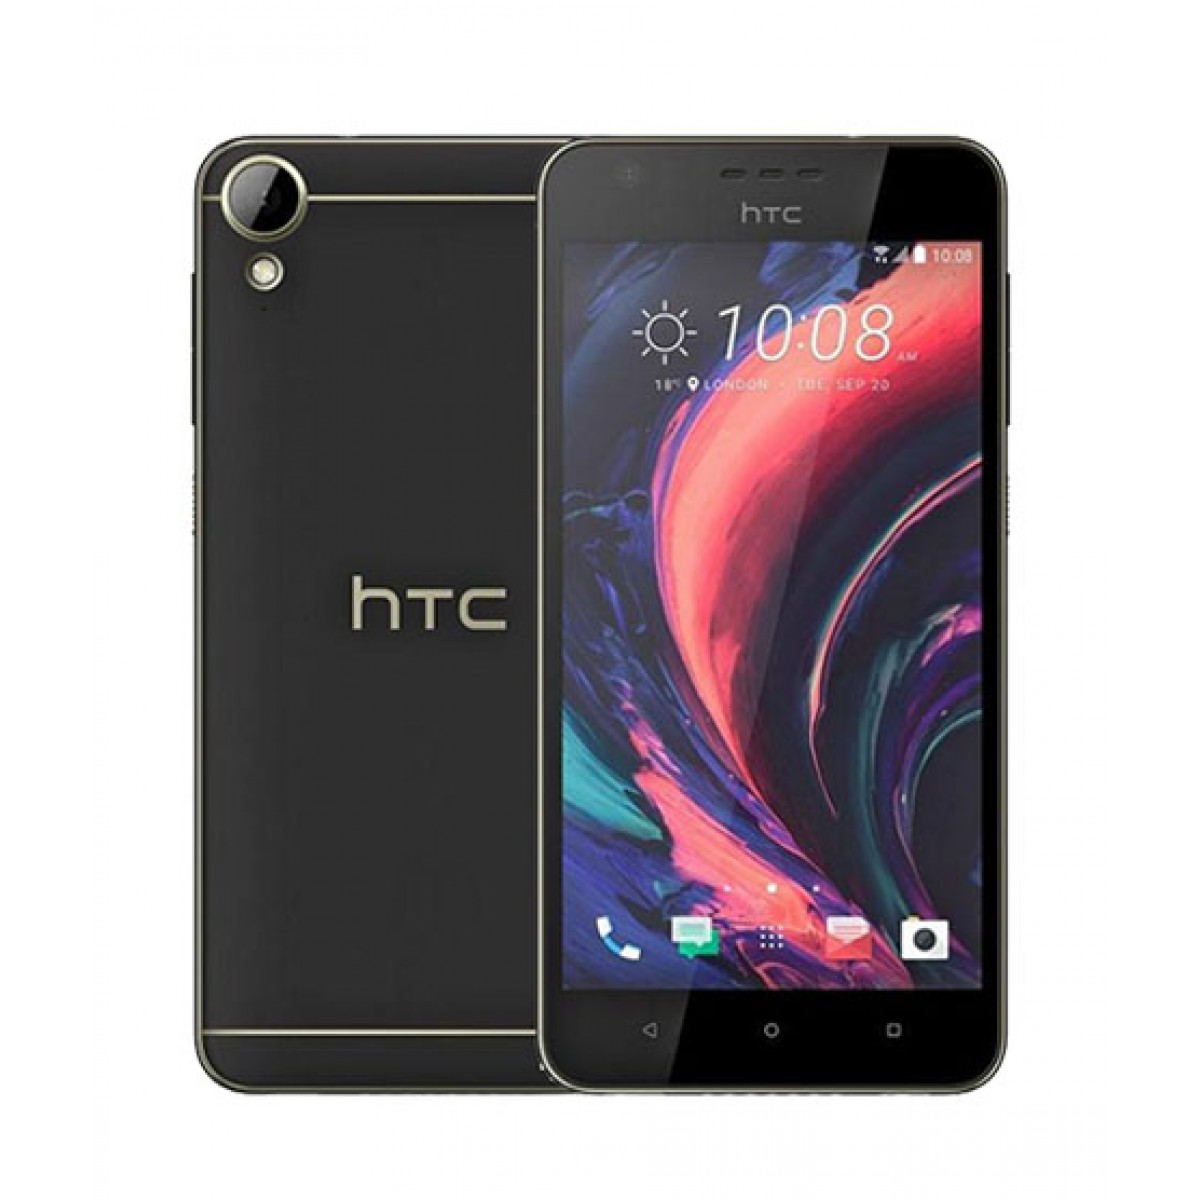 HTC Desire 10 Lifestyle 16GB Dual Sim Stone Black